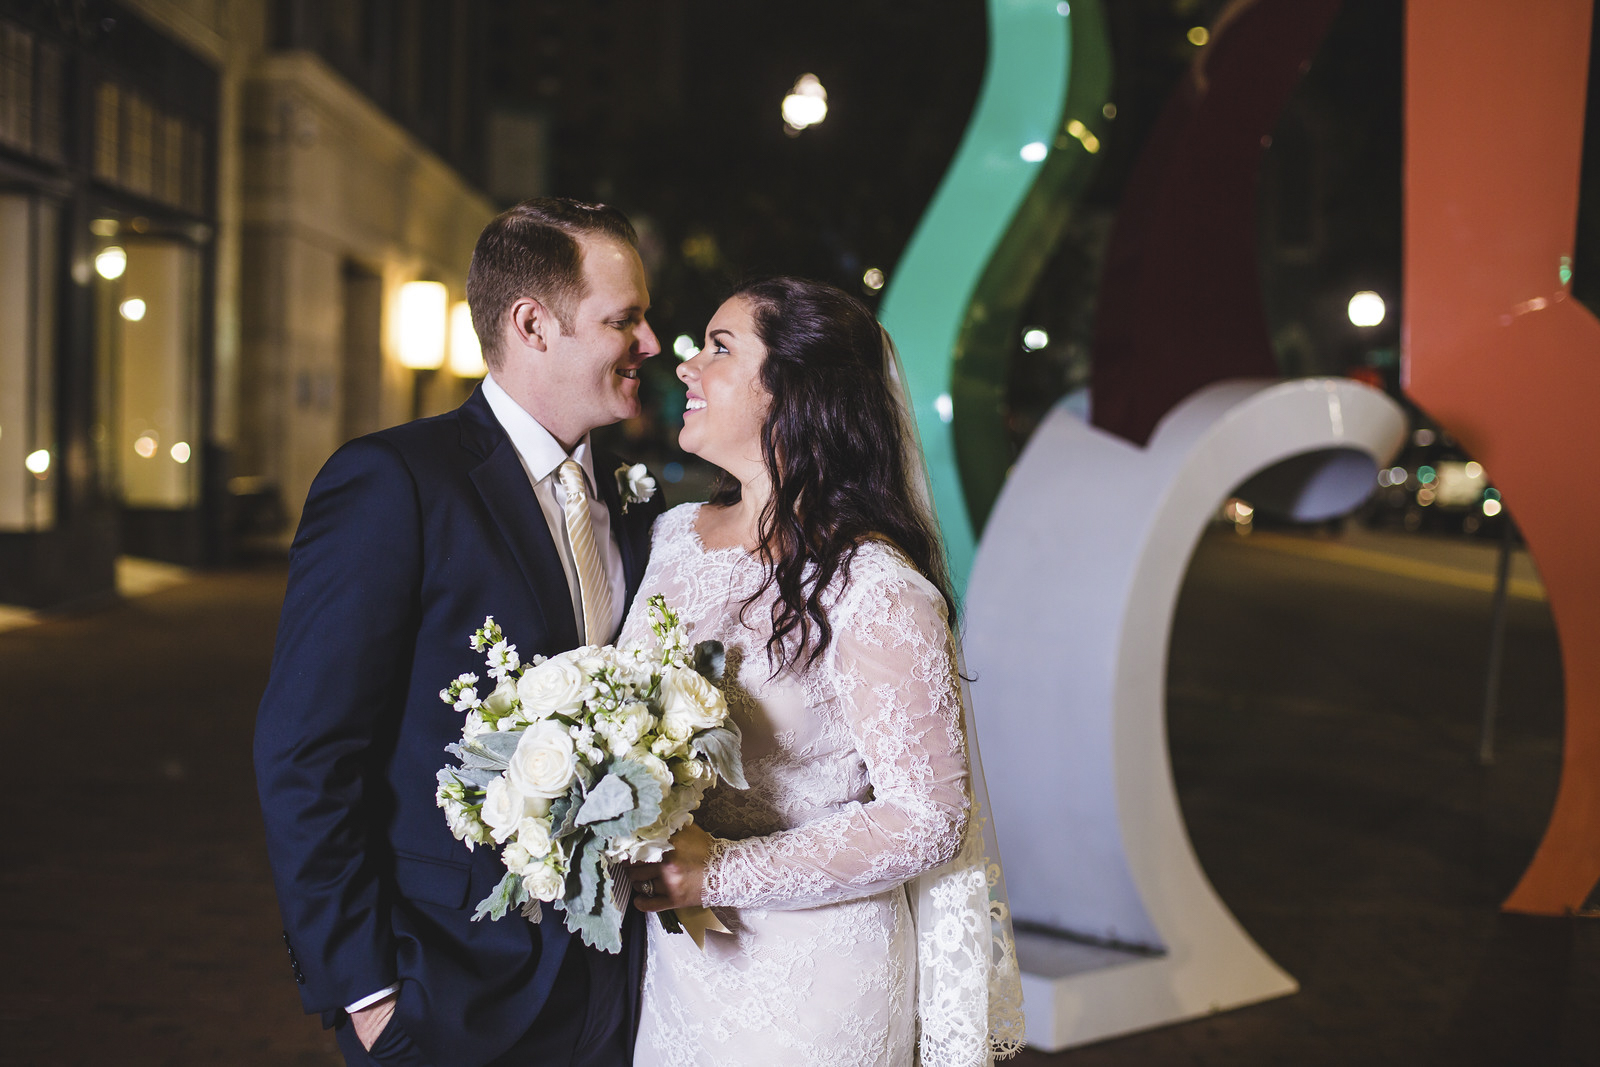 adam-szarmack-moca-wedding-jacksonville-31.jpg